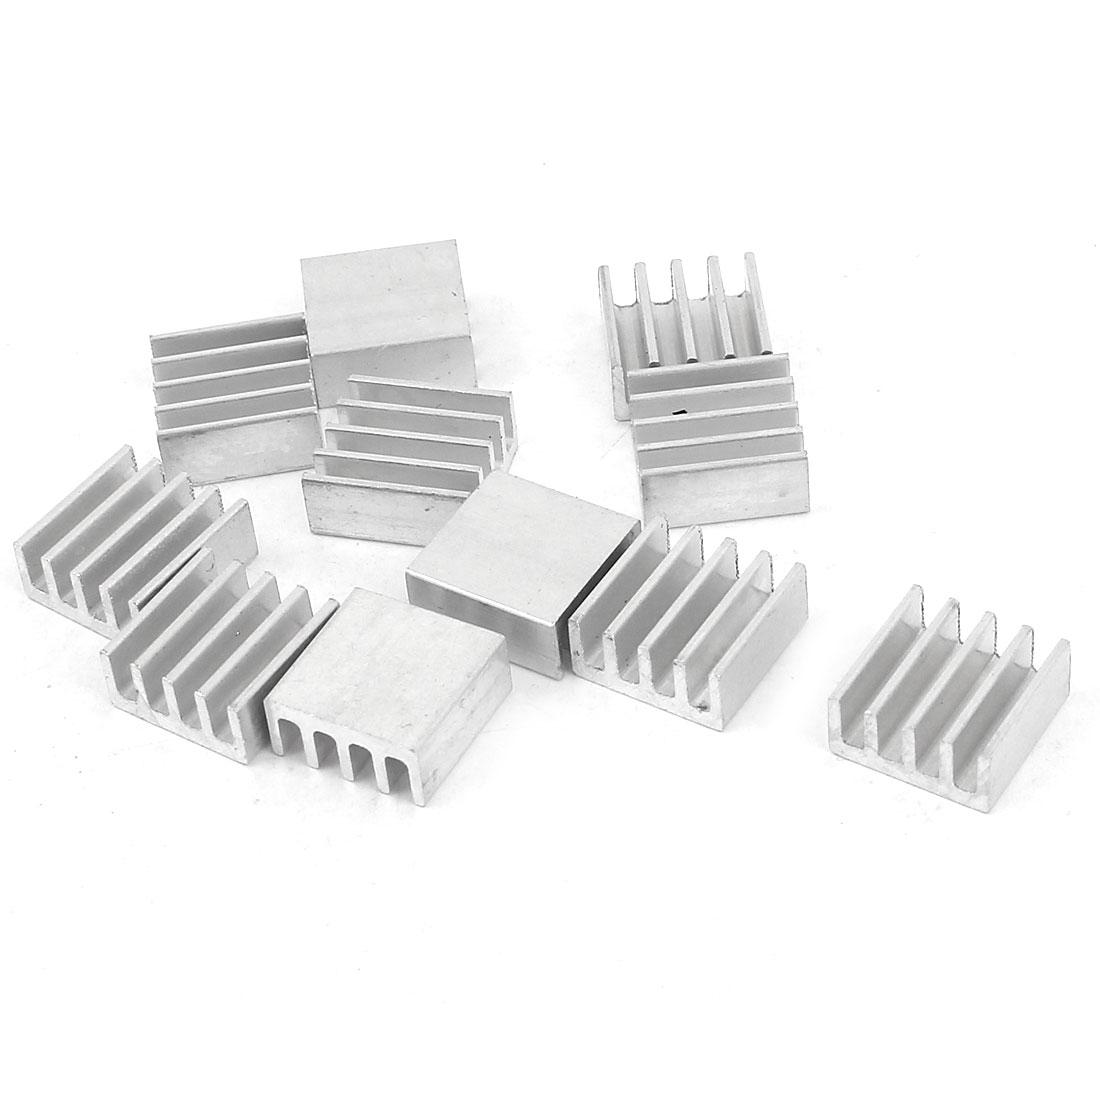 10 Pcs Silver Tone Aluminum Cooler Radiator Heat Sink Heatsink 11mm x 11mm x 5mm